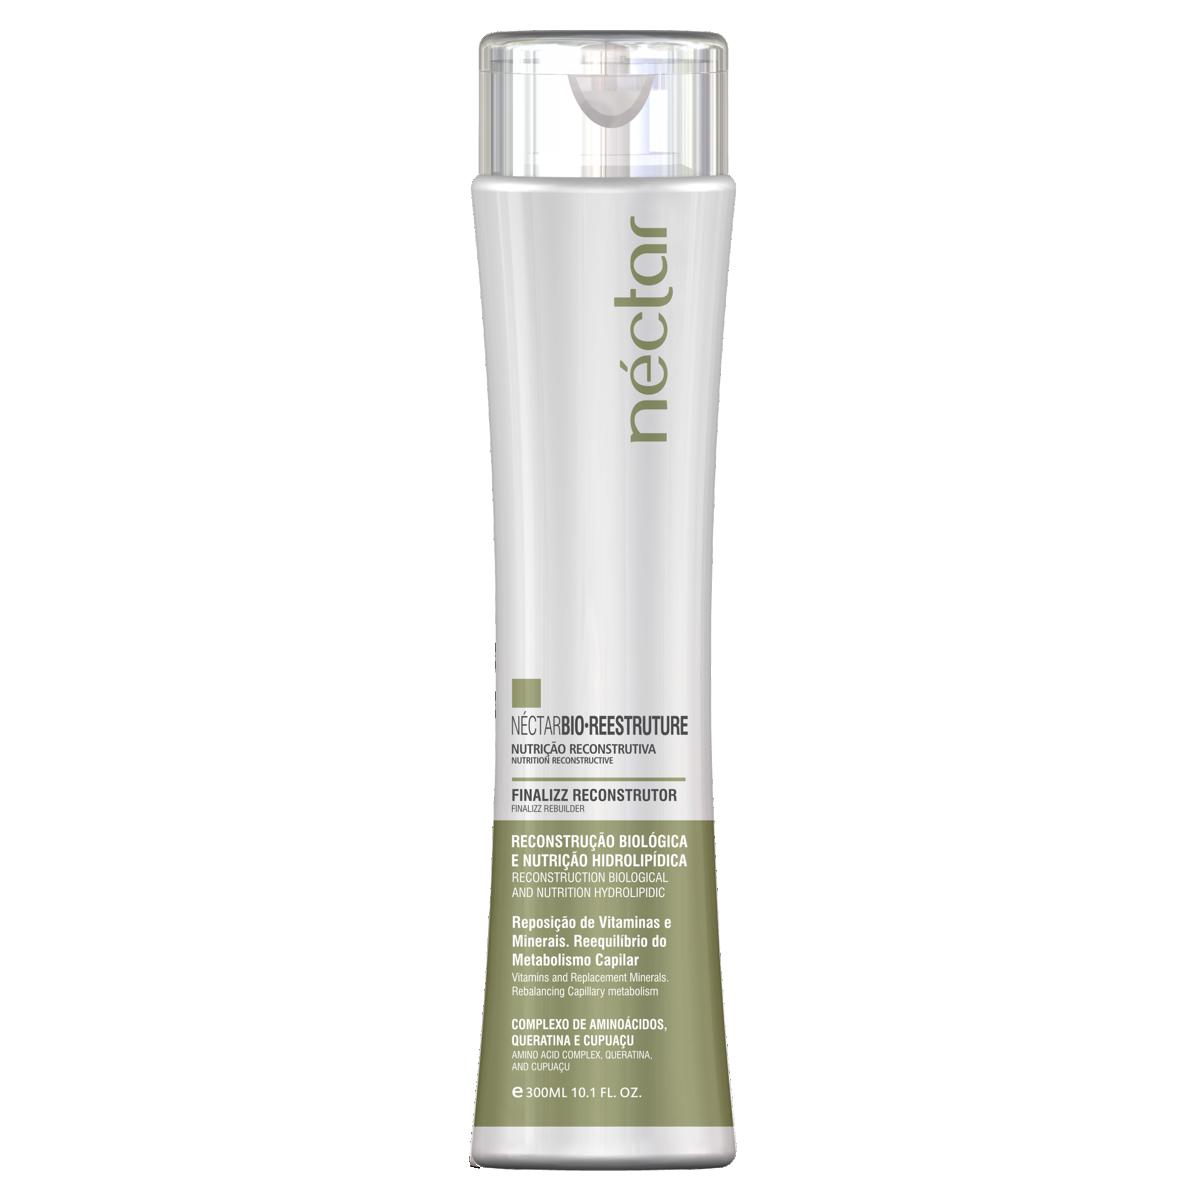 Leave-in Reconstrutor para cabelos Desidratados e Ressecados - Néctar Bio Reestruture